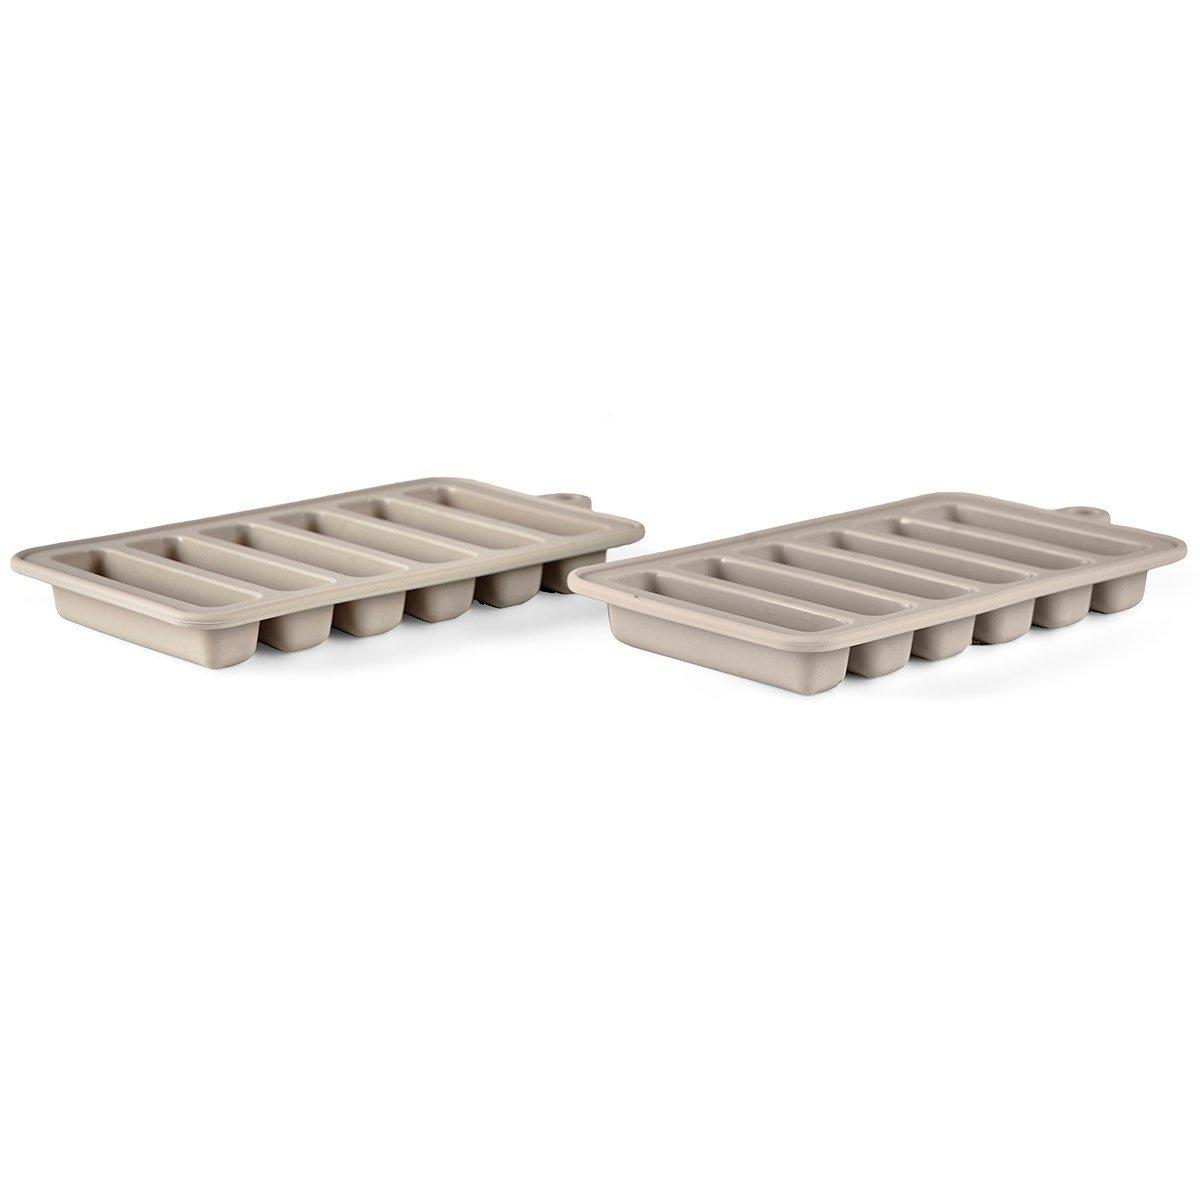 Bitz - Icecube Tray 16 x 9,5 x 2 cm - Grey (11619)